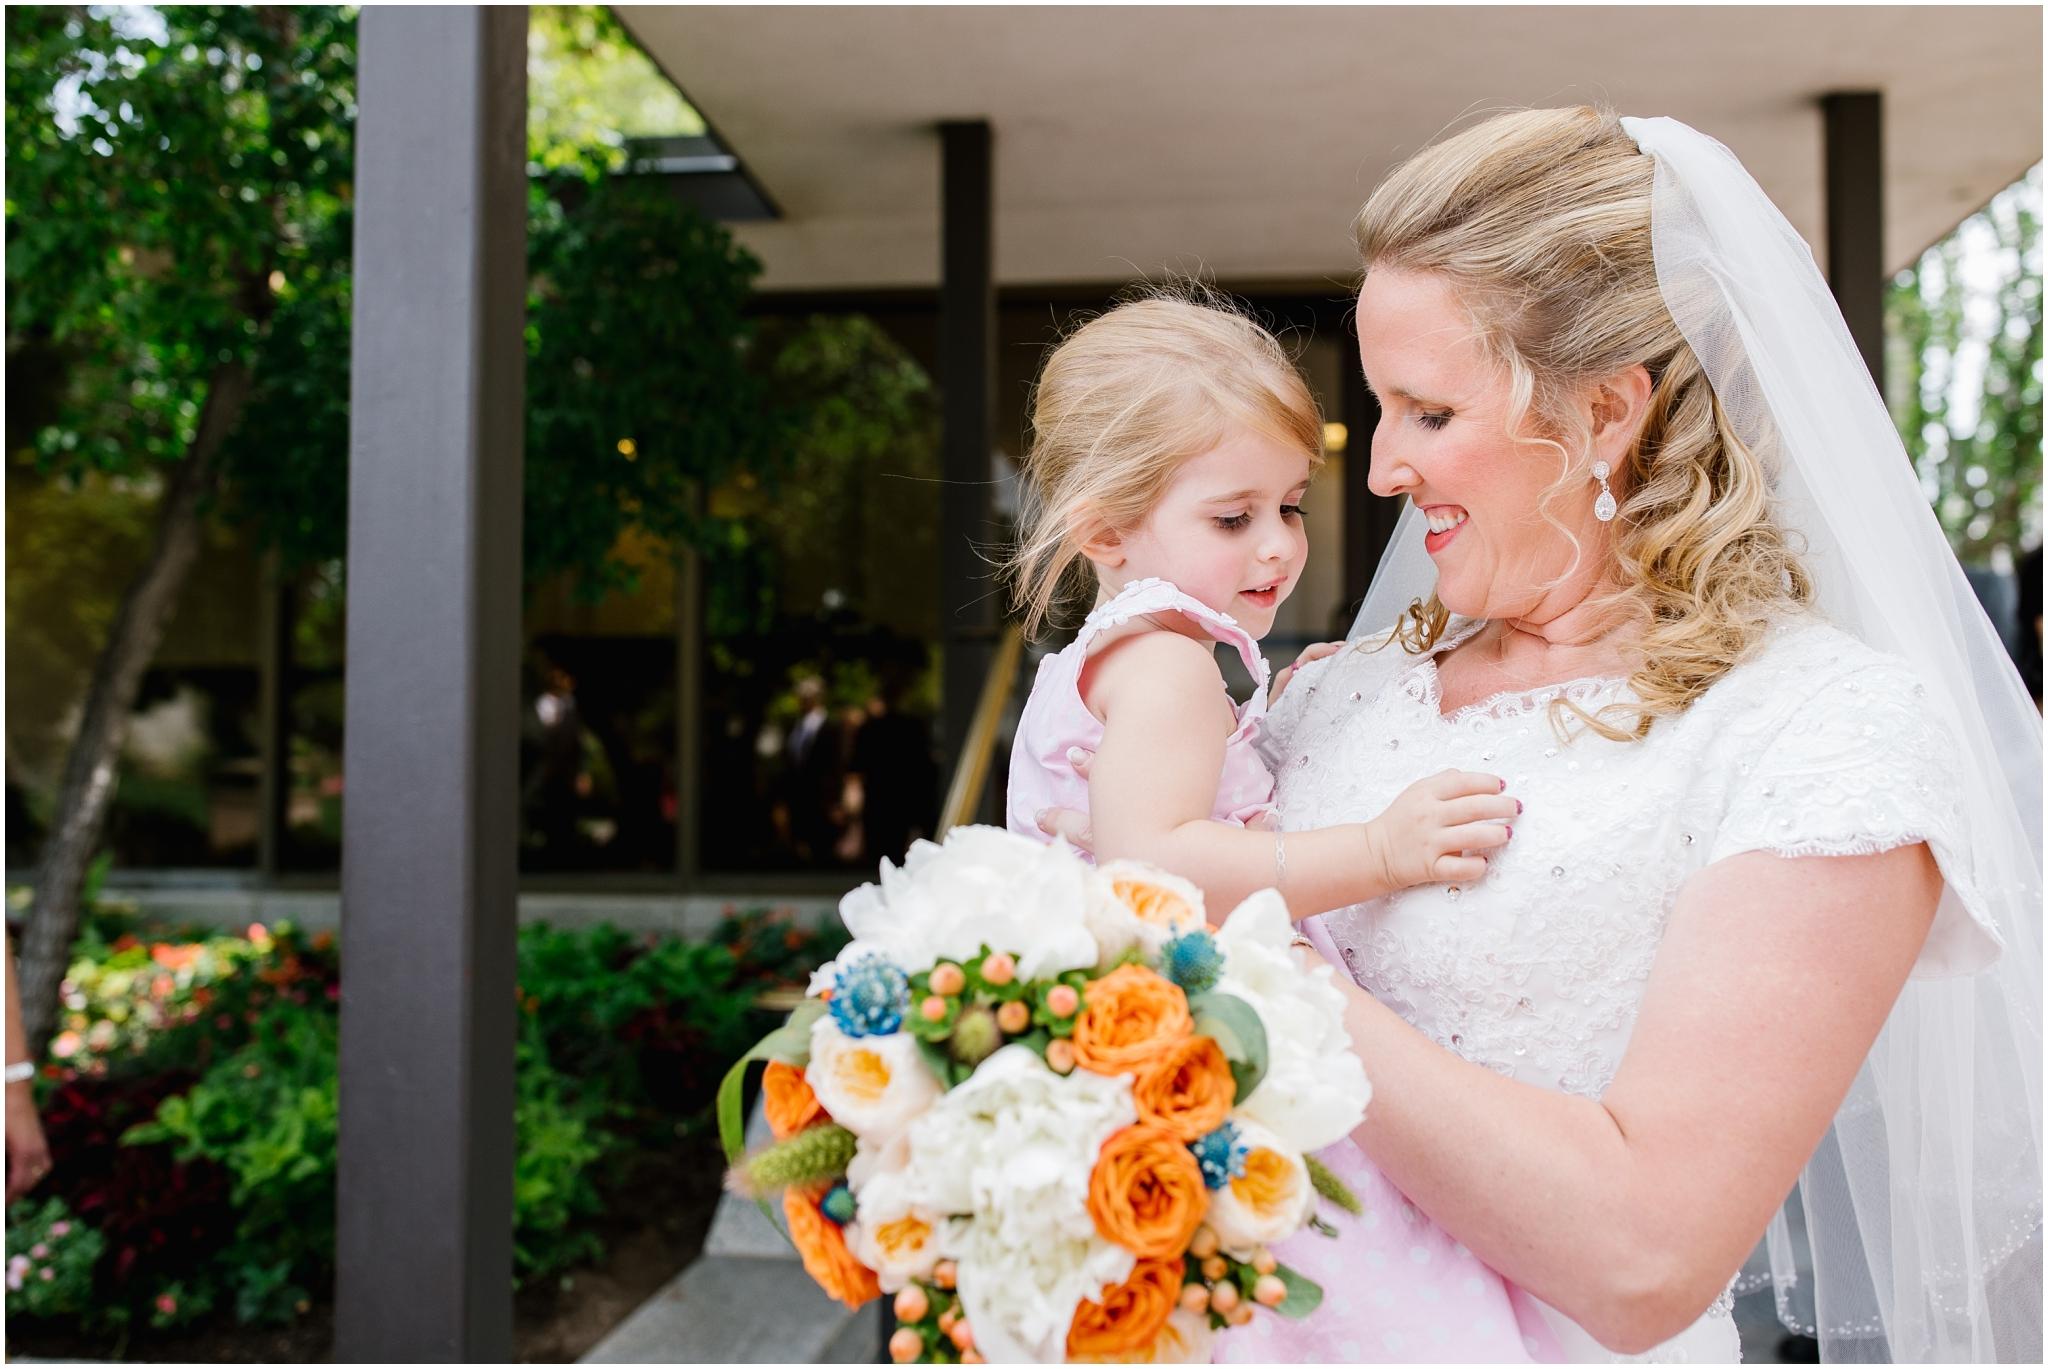 Justin and Melissa-16_Lizzie-B-Imagery-Utah-Wedding-Photographer-Salt-Lake-City-Temple-The-Grand-Ballroom.jpg